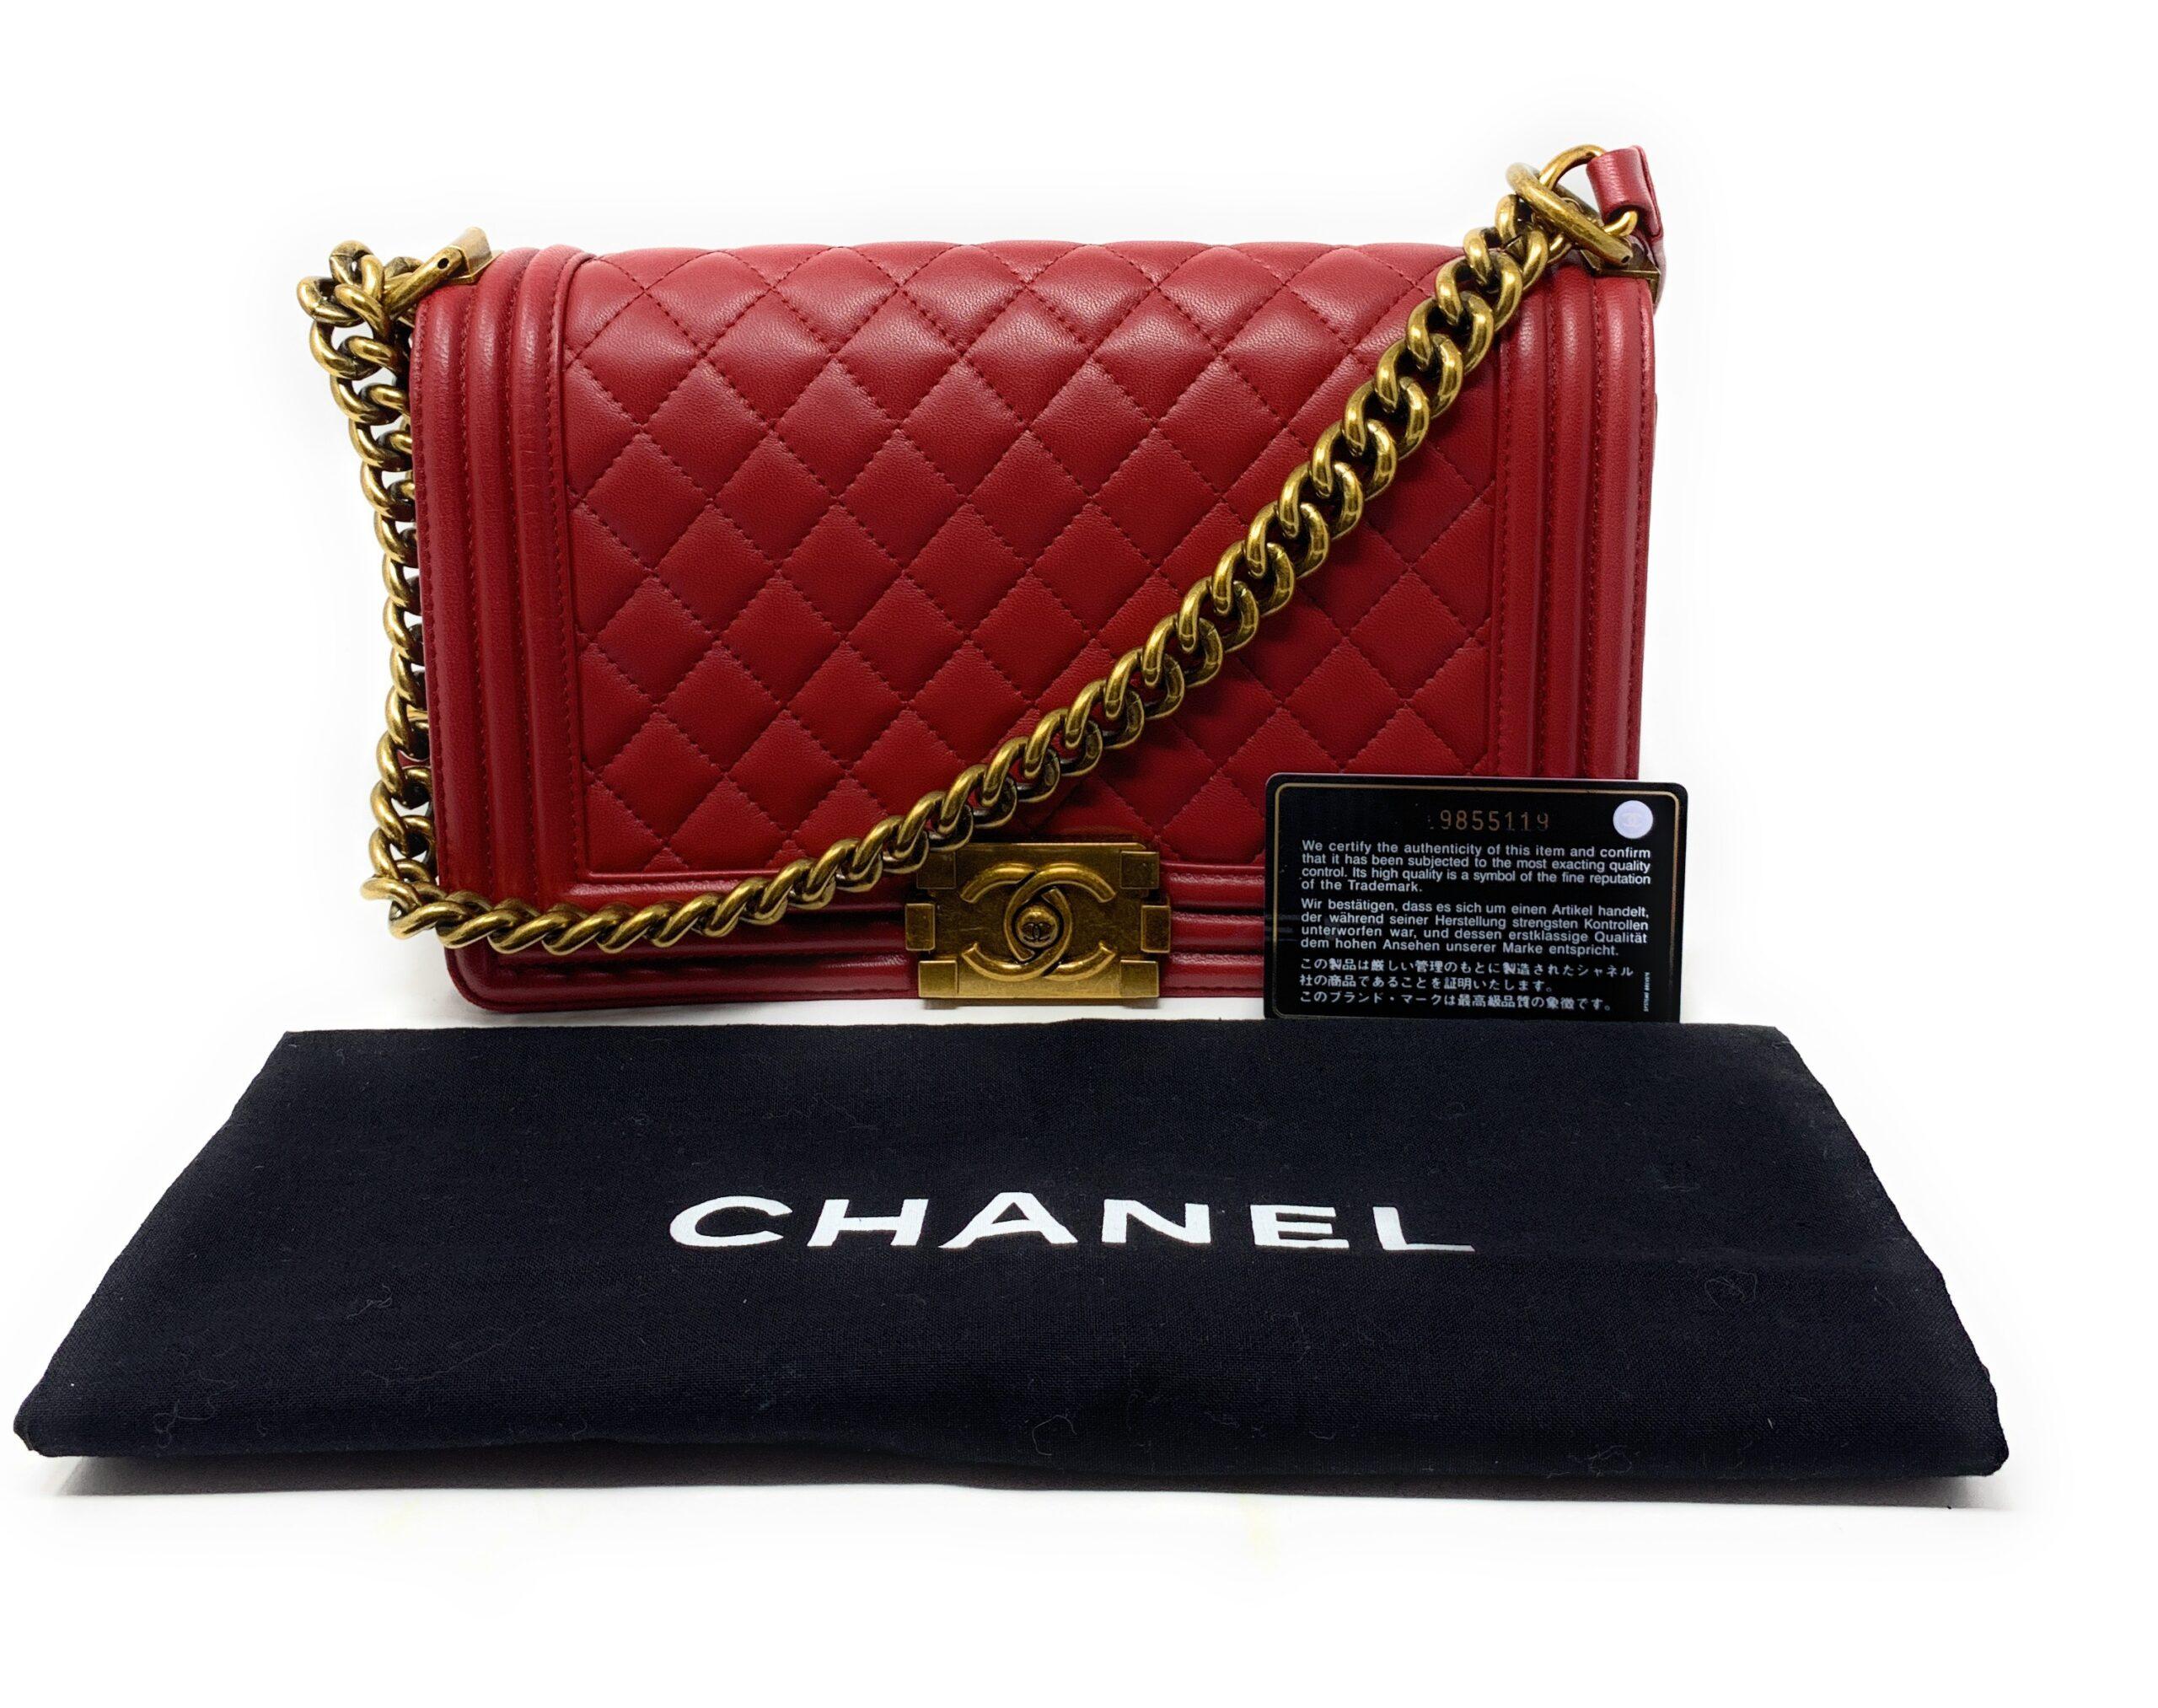 High-End Handbag Appraisal, Miami, FL | High-End Handbag Buyers